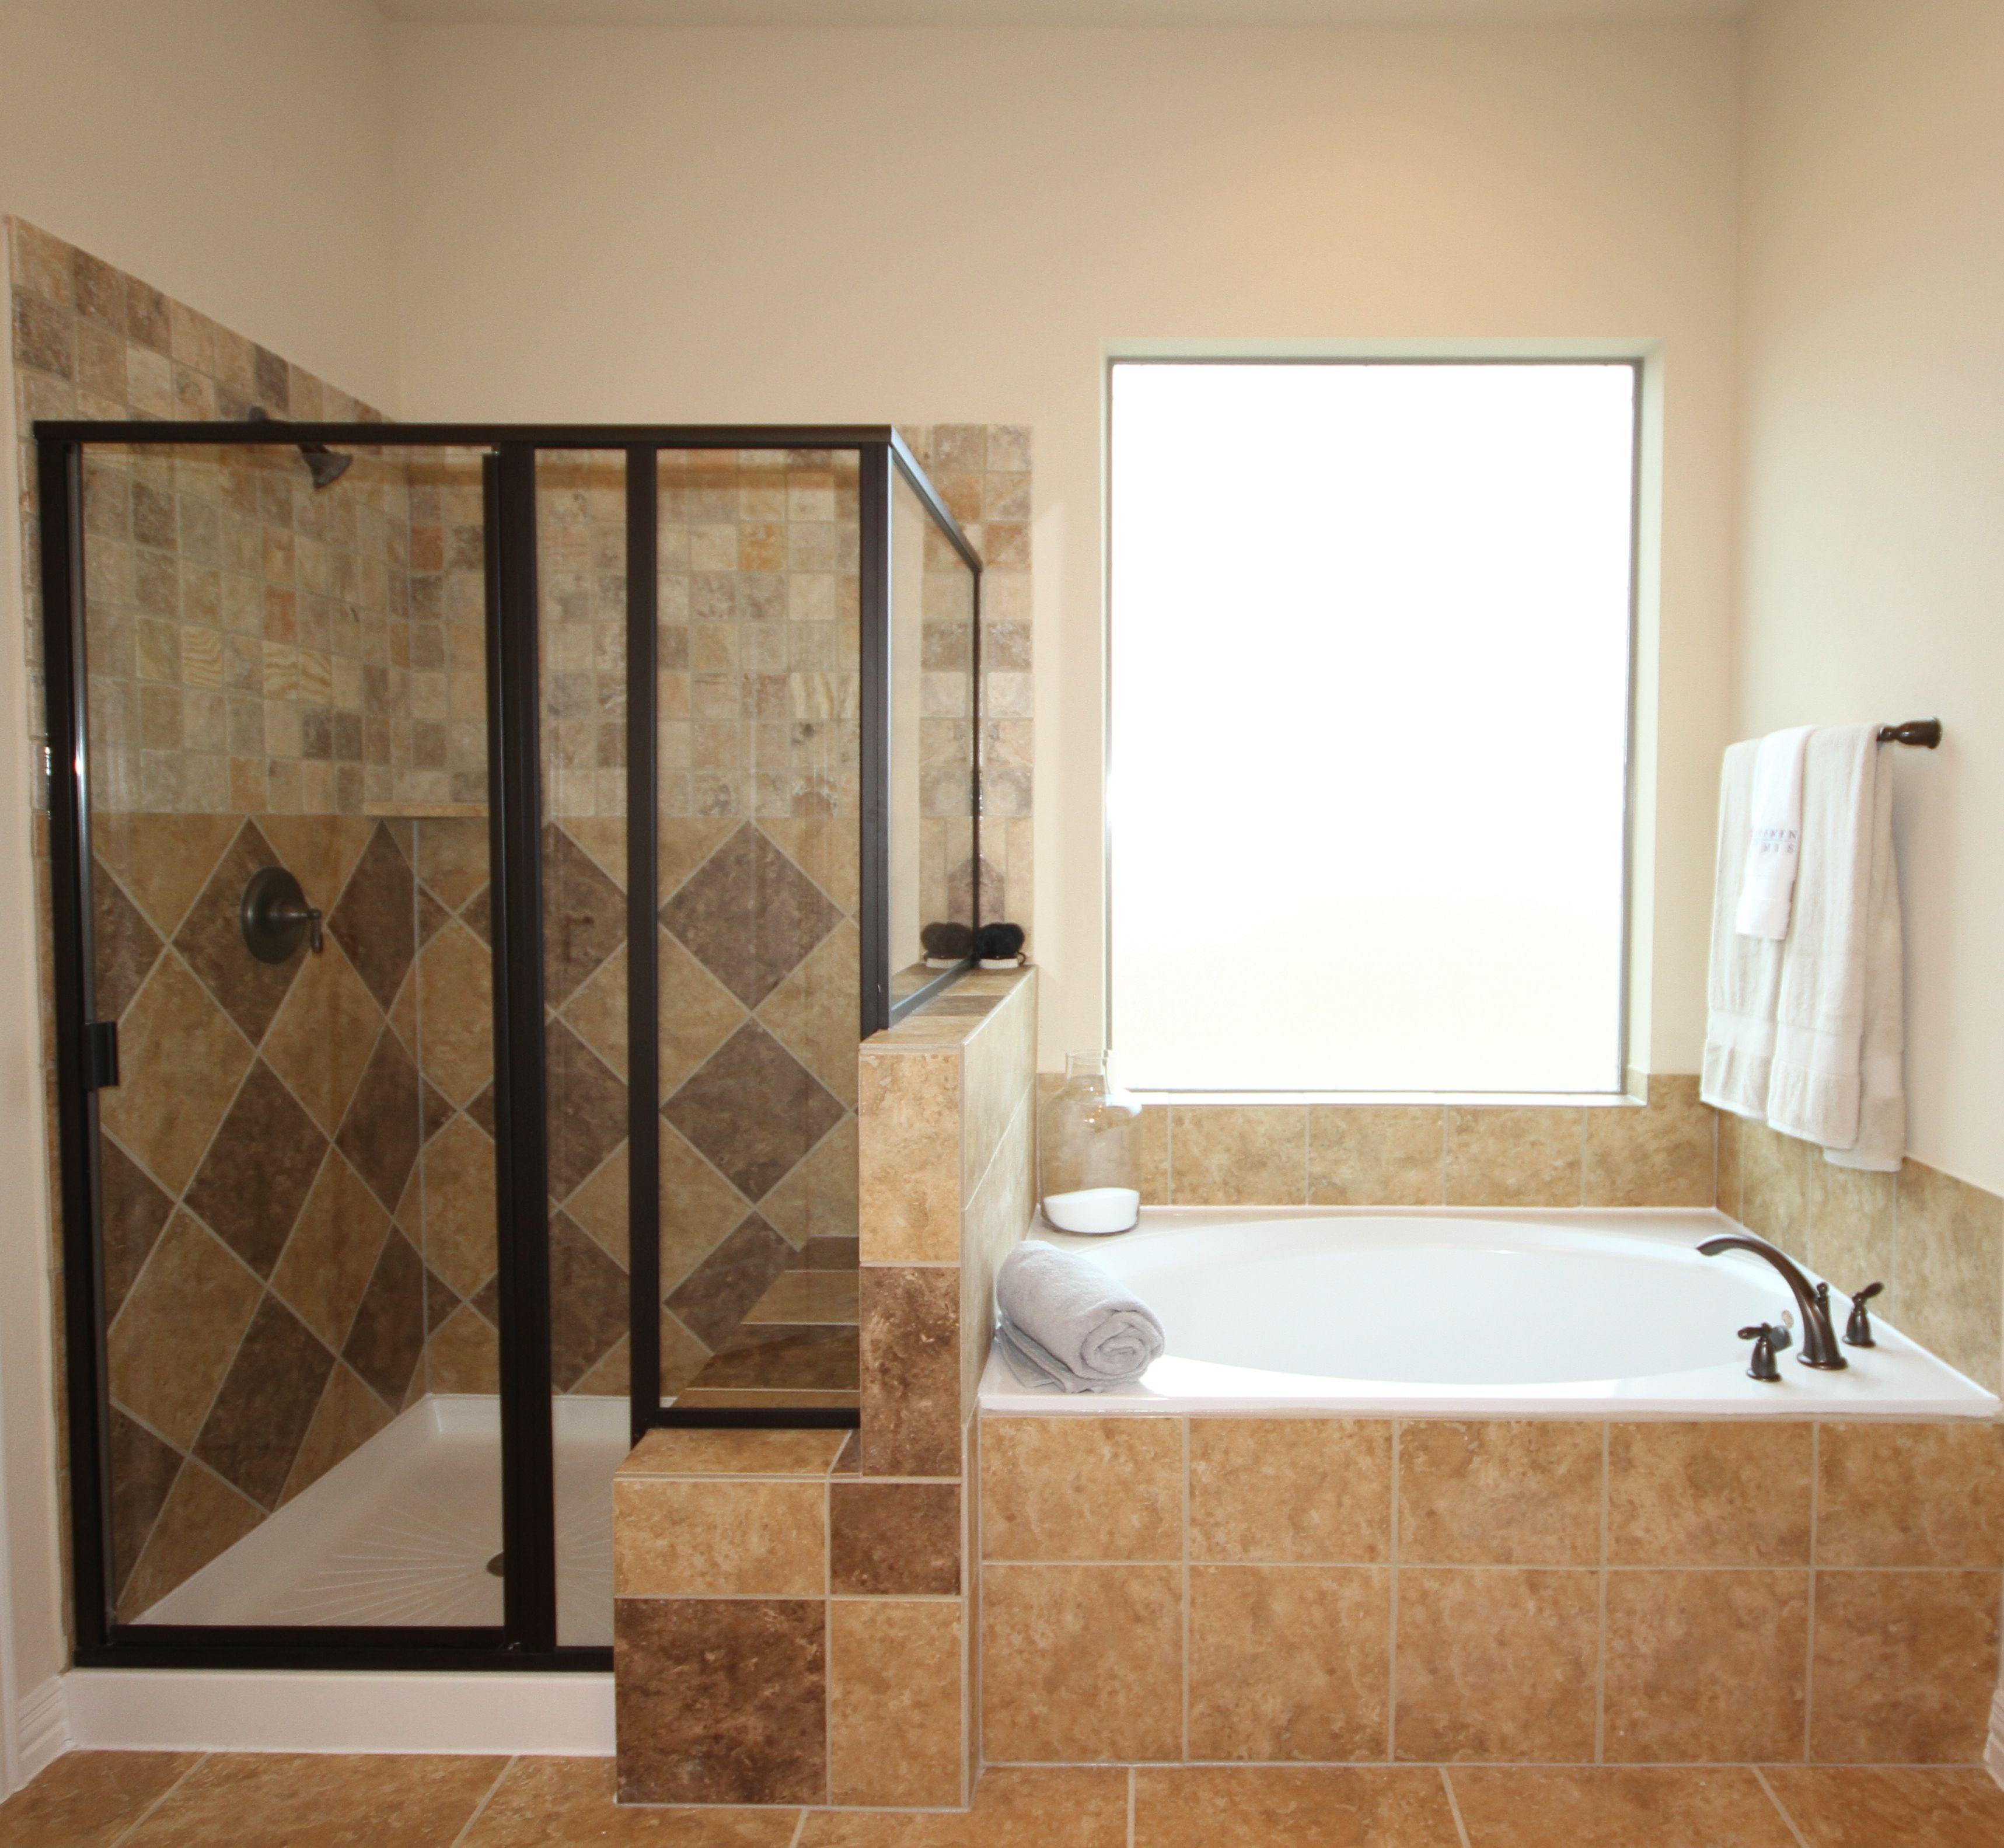 Kinsmen Homes Meagan Plan Harlequin tile design in shower